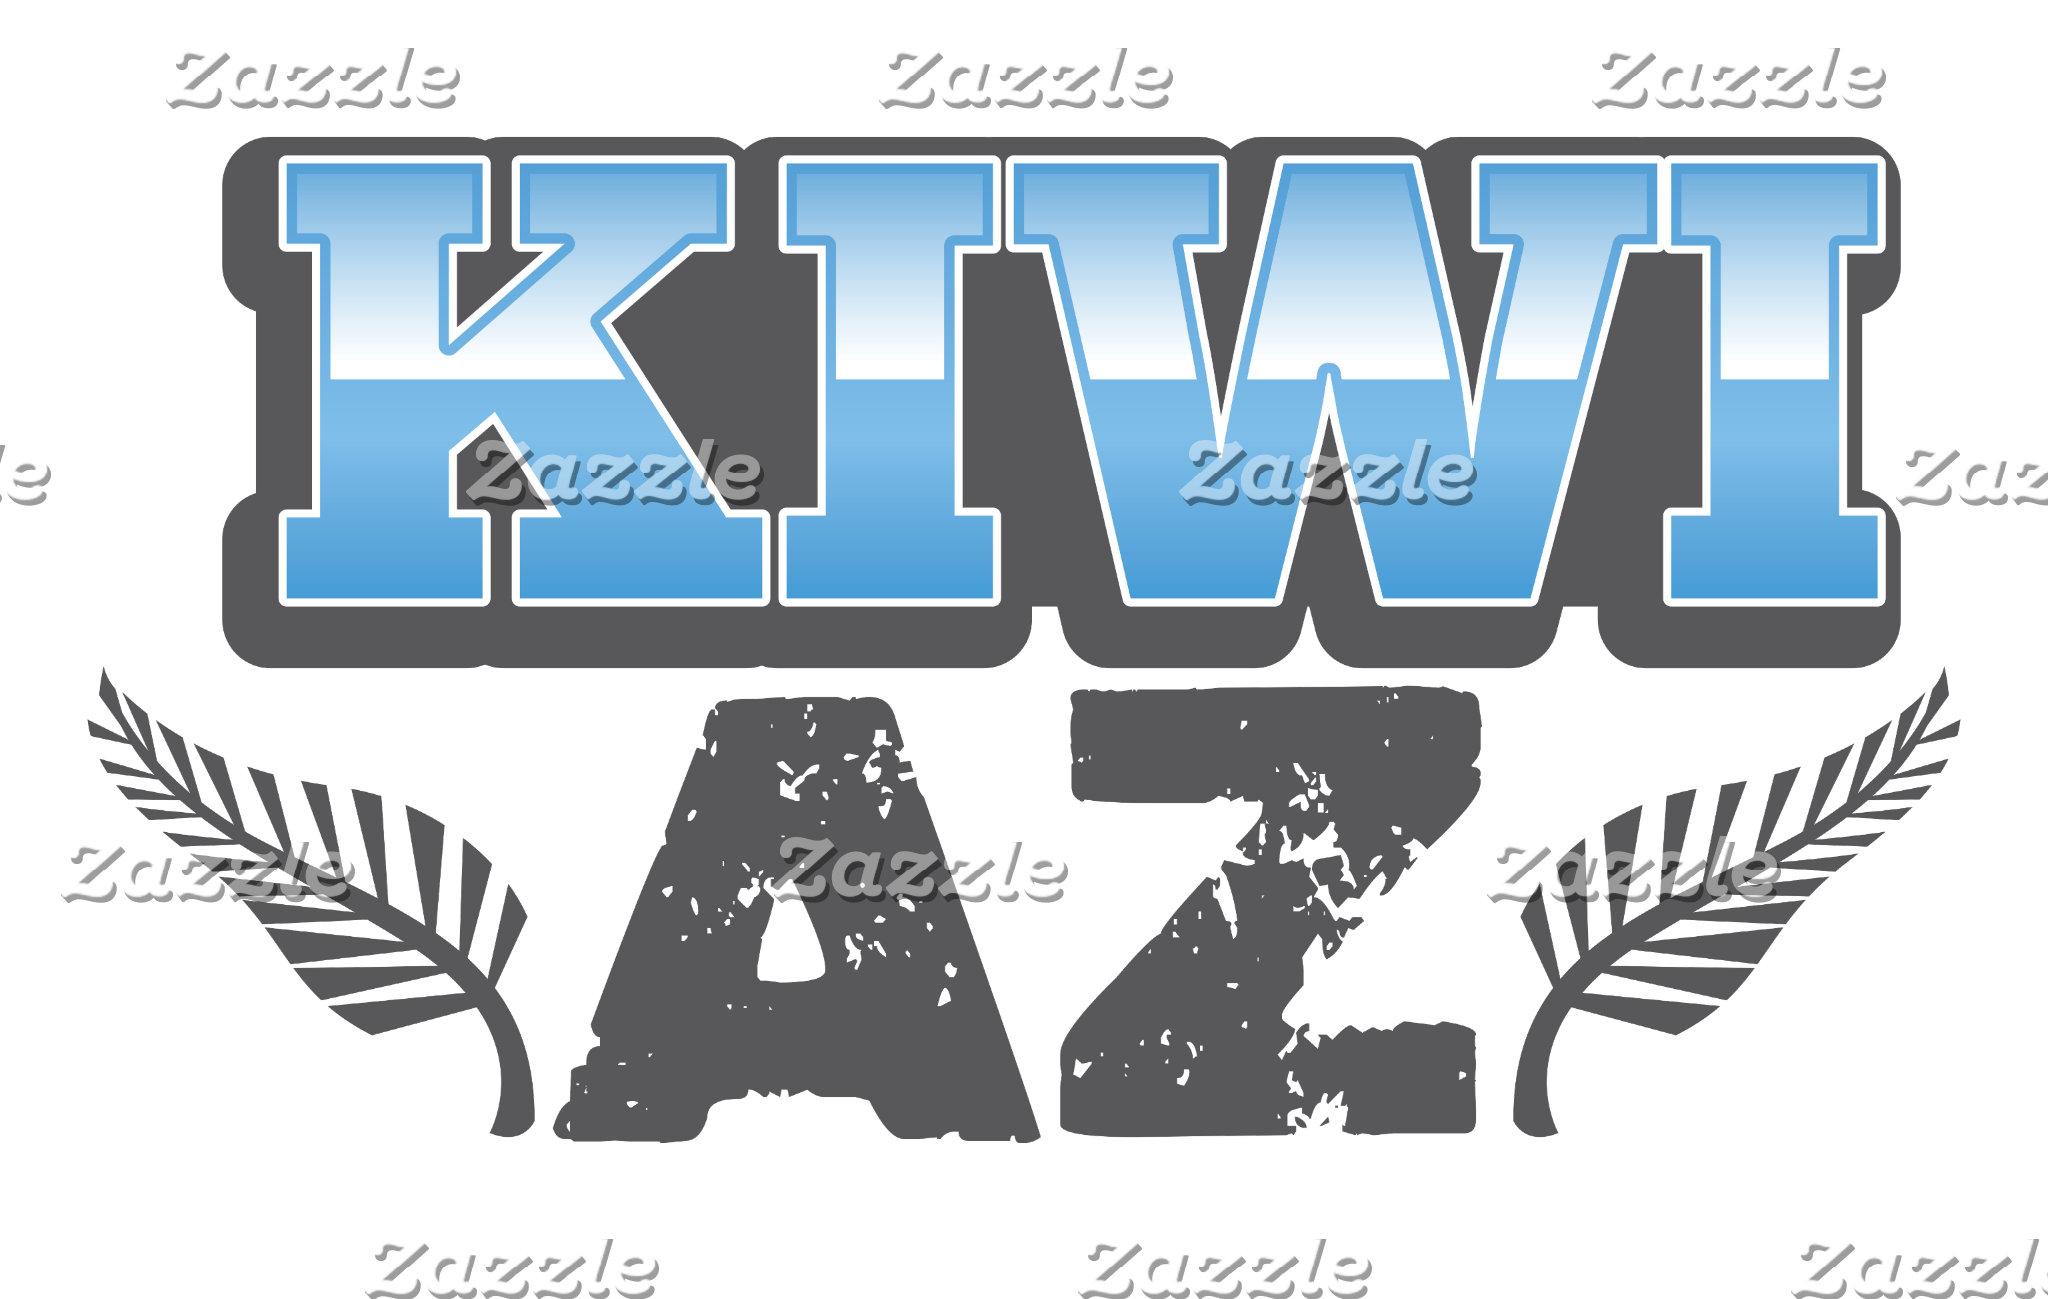 Kiwi az in blue and silver